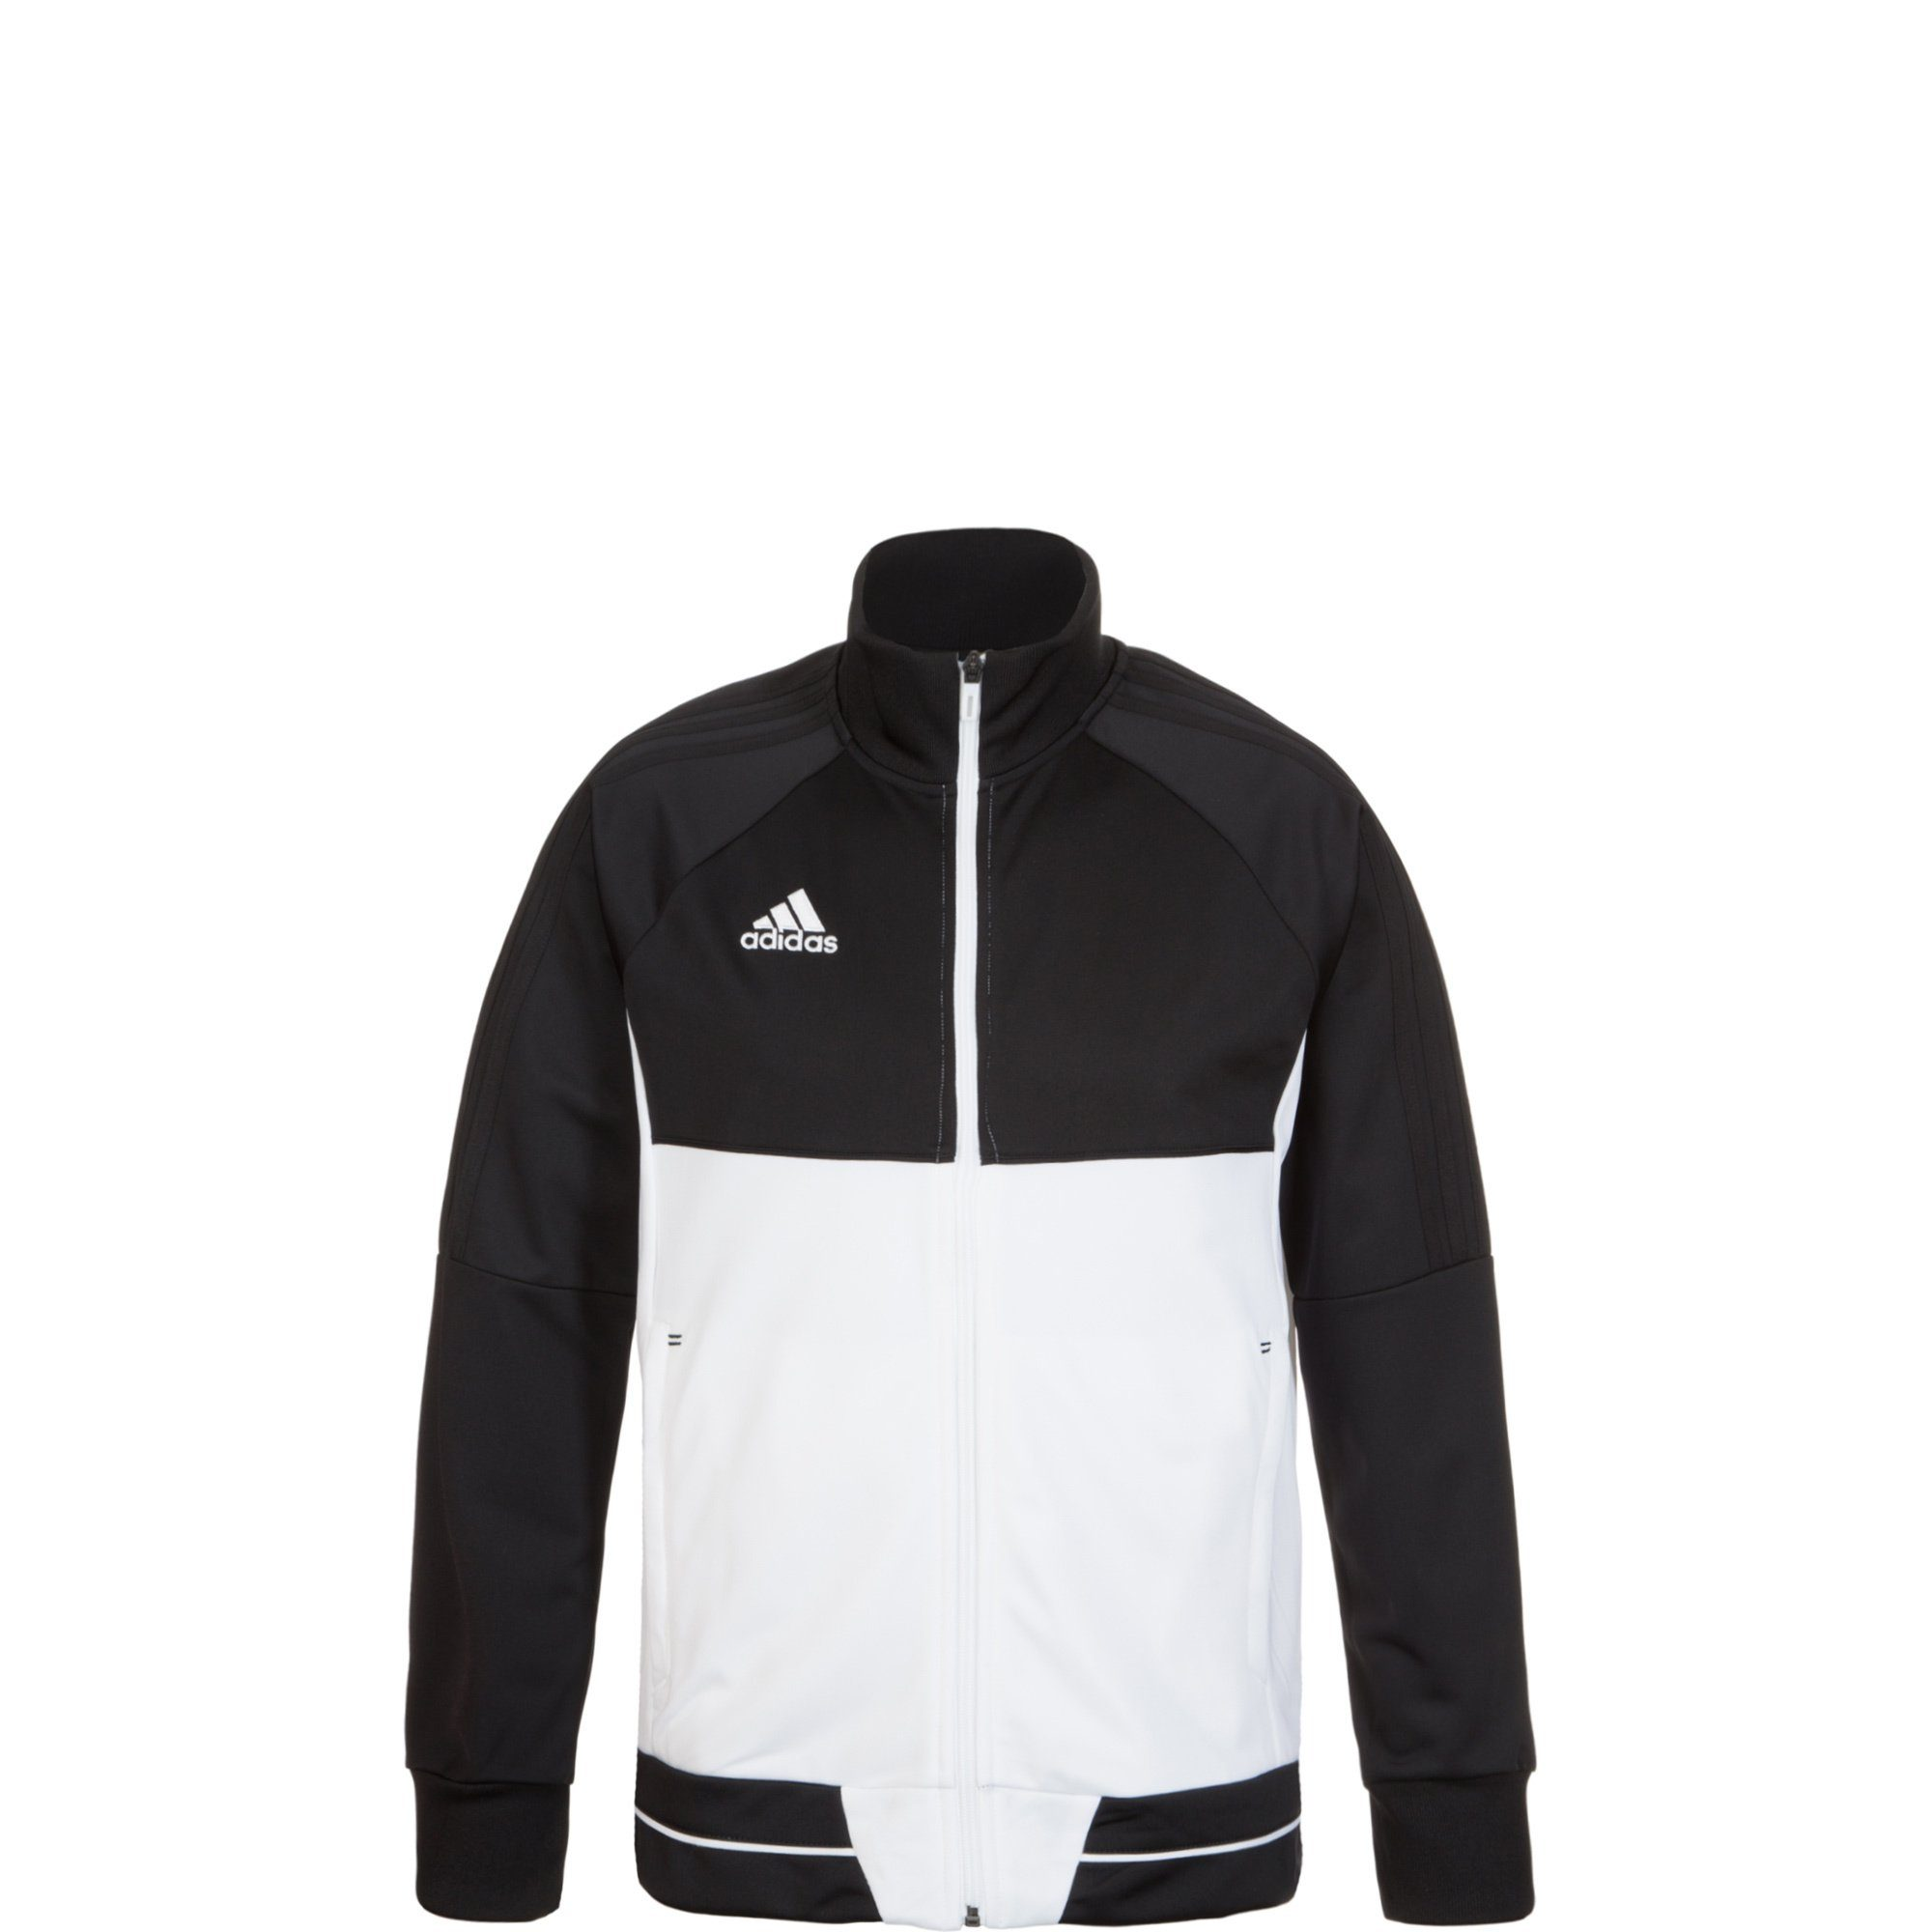 adidas Herren Tiro 17 Winter Jacke, BlackWhite, L Trend 2021